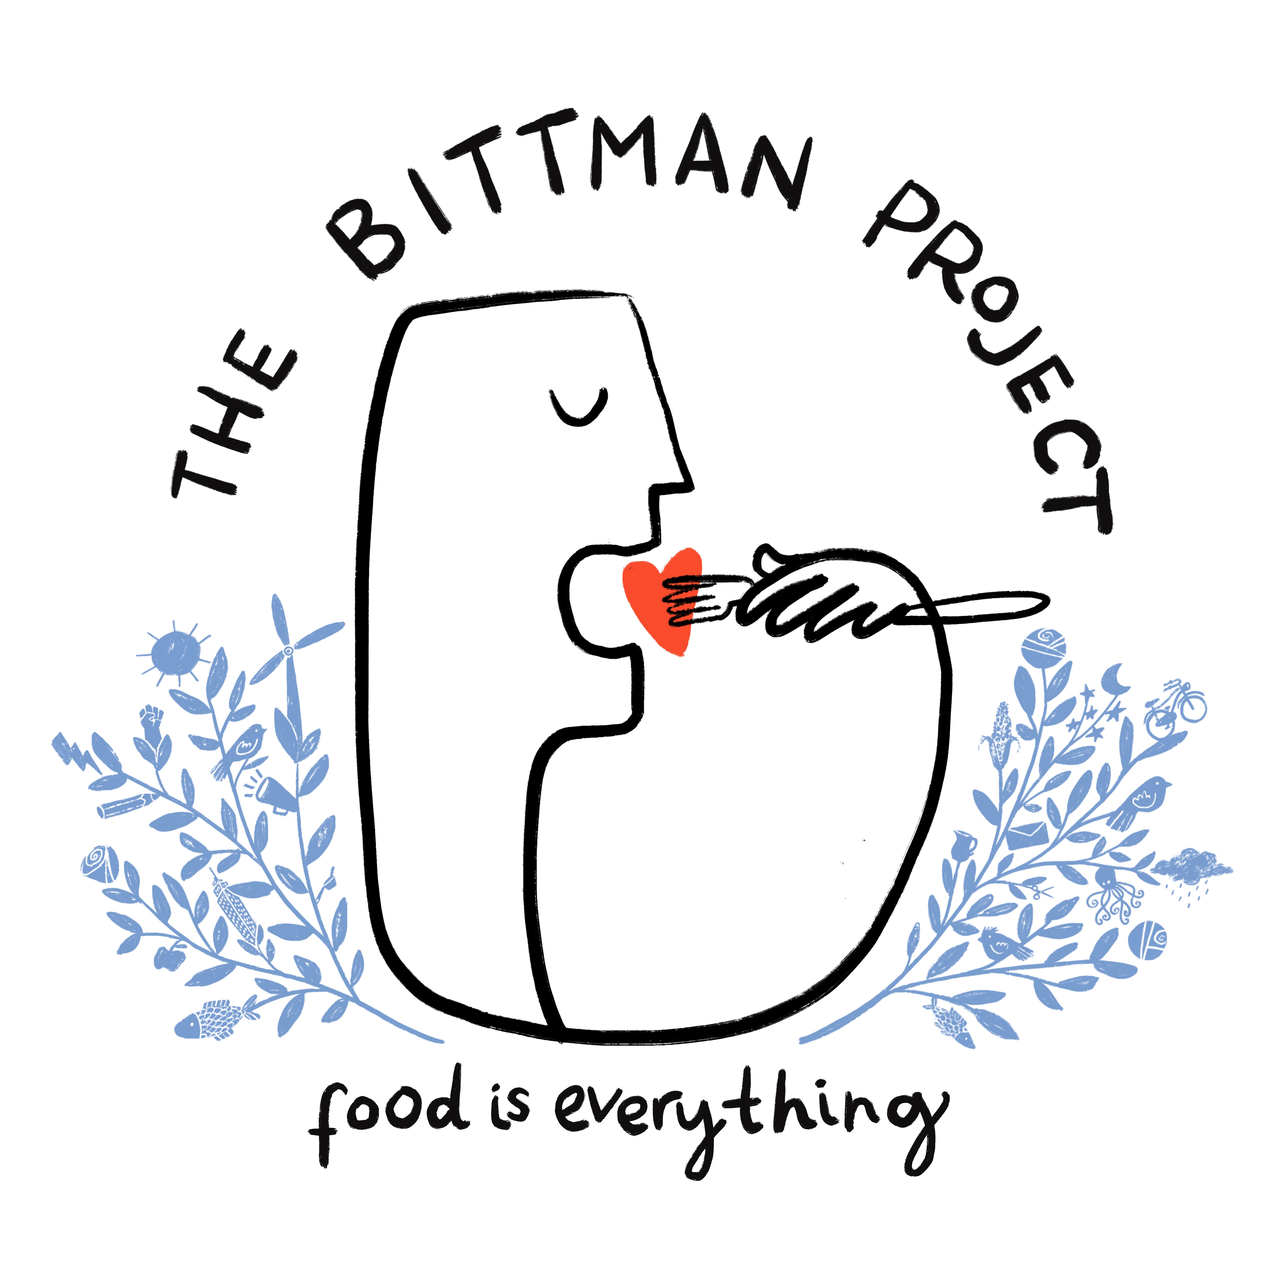 The Bittman Project